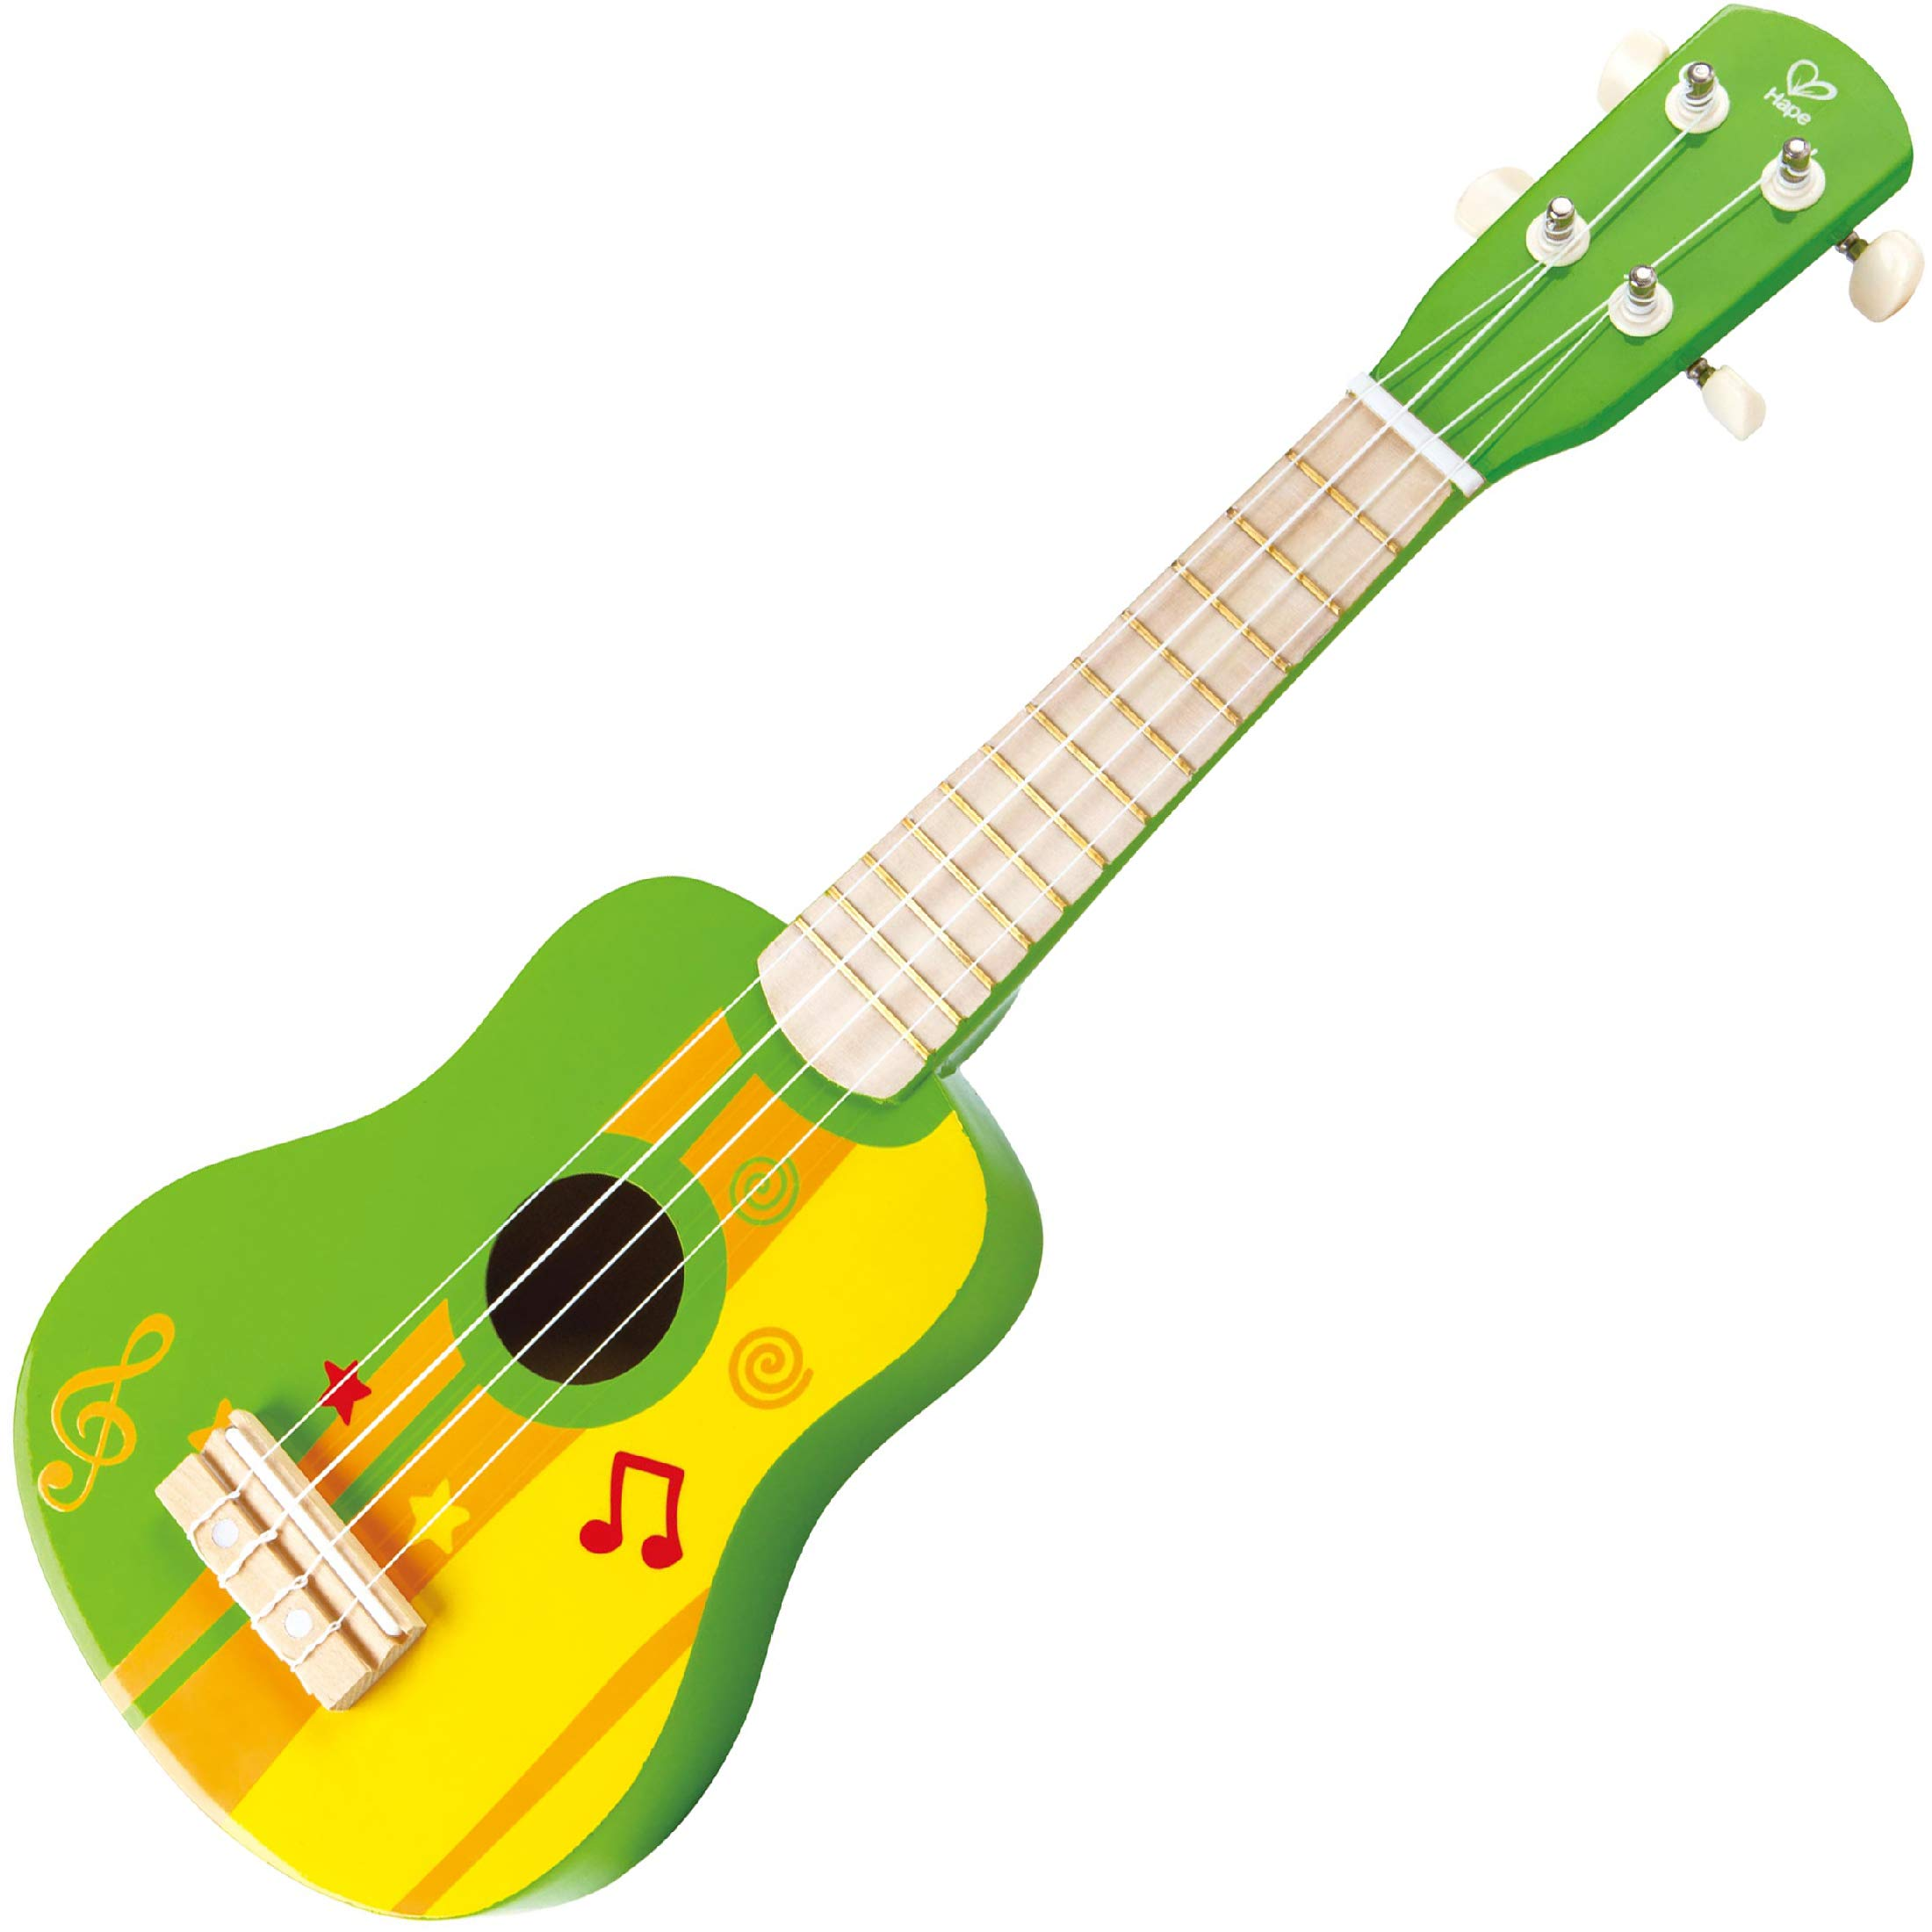 Kids Ukulele Toy Guitar for Toddlers - Hape Wooden Ukulele Kids Guitar for Girls or Boys; Starter Acoustic Hawaiian Ukulele Musical Instrument (Green)